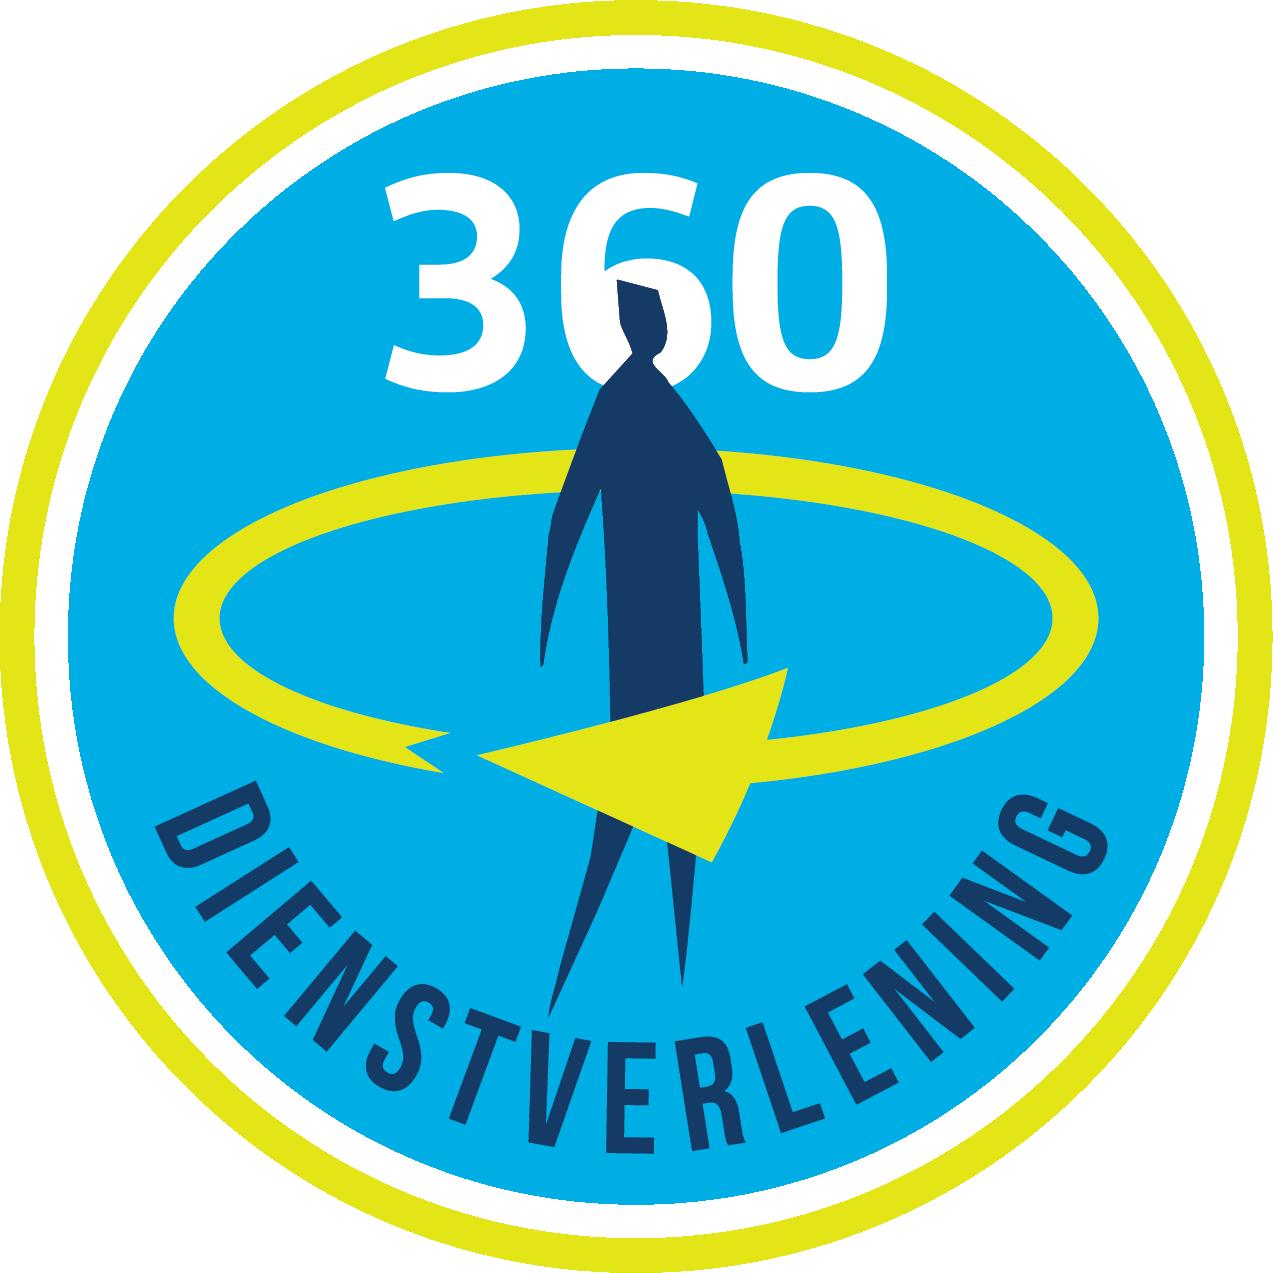 aclvb-universele_diensten-logo-cmyk_ok-2_4.png